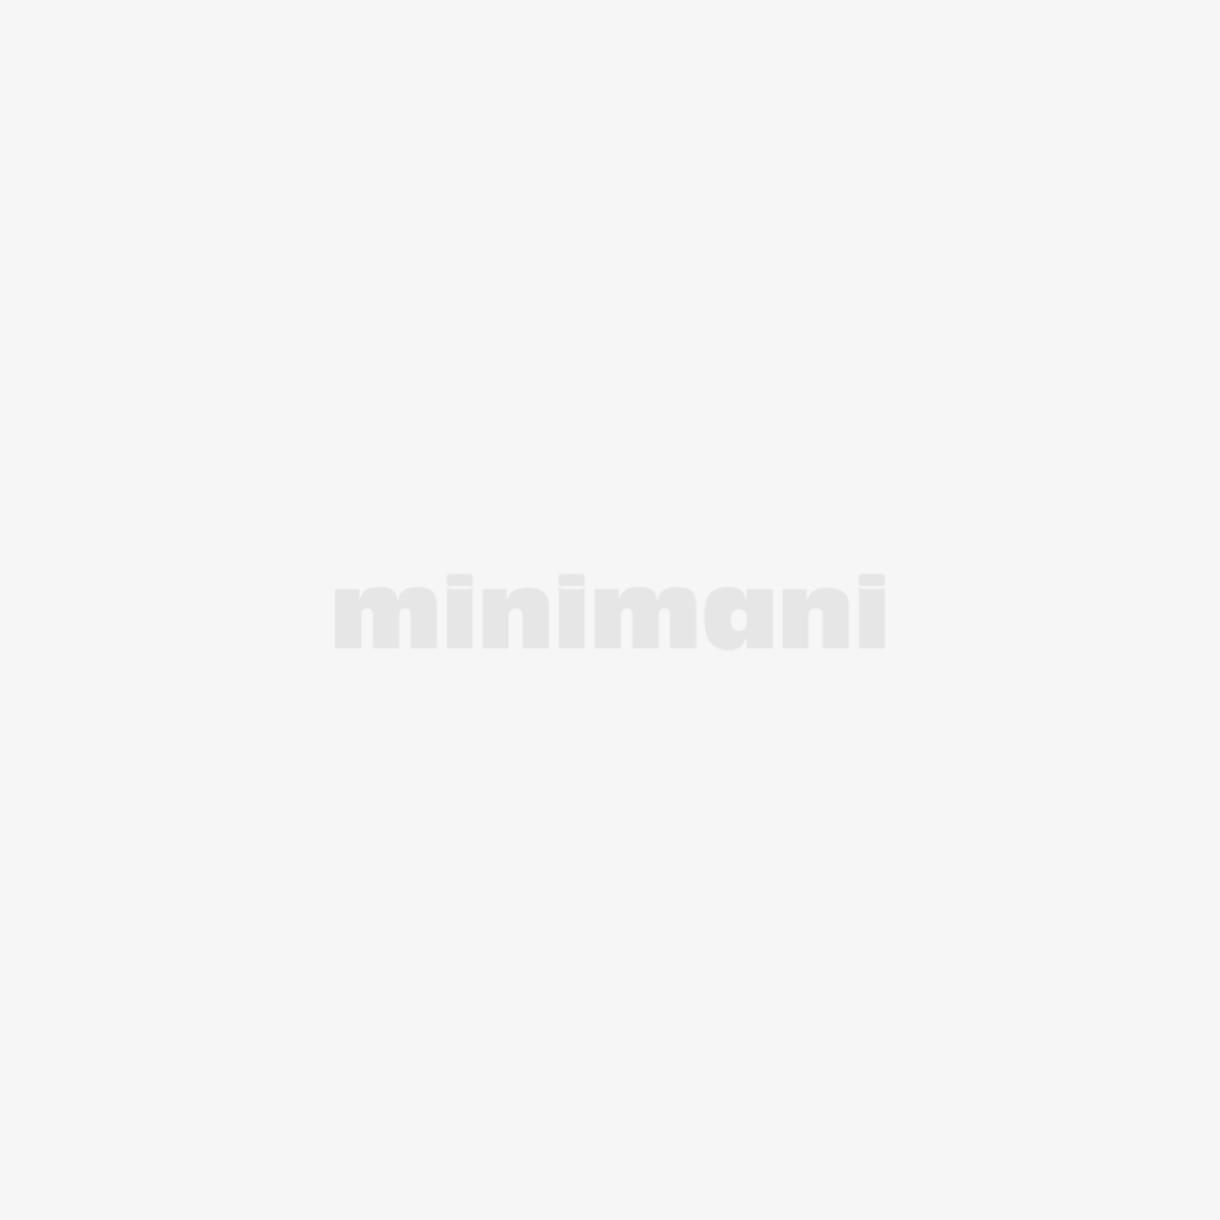 AIRAM VANAMO VÄLITILAVALAISIN 108 8W PR + K HOPEA G5 300